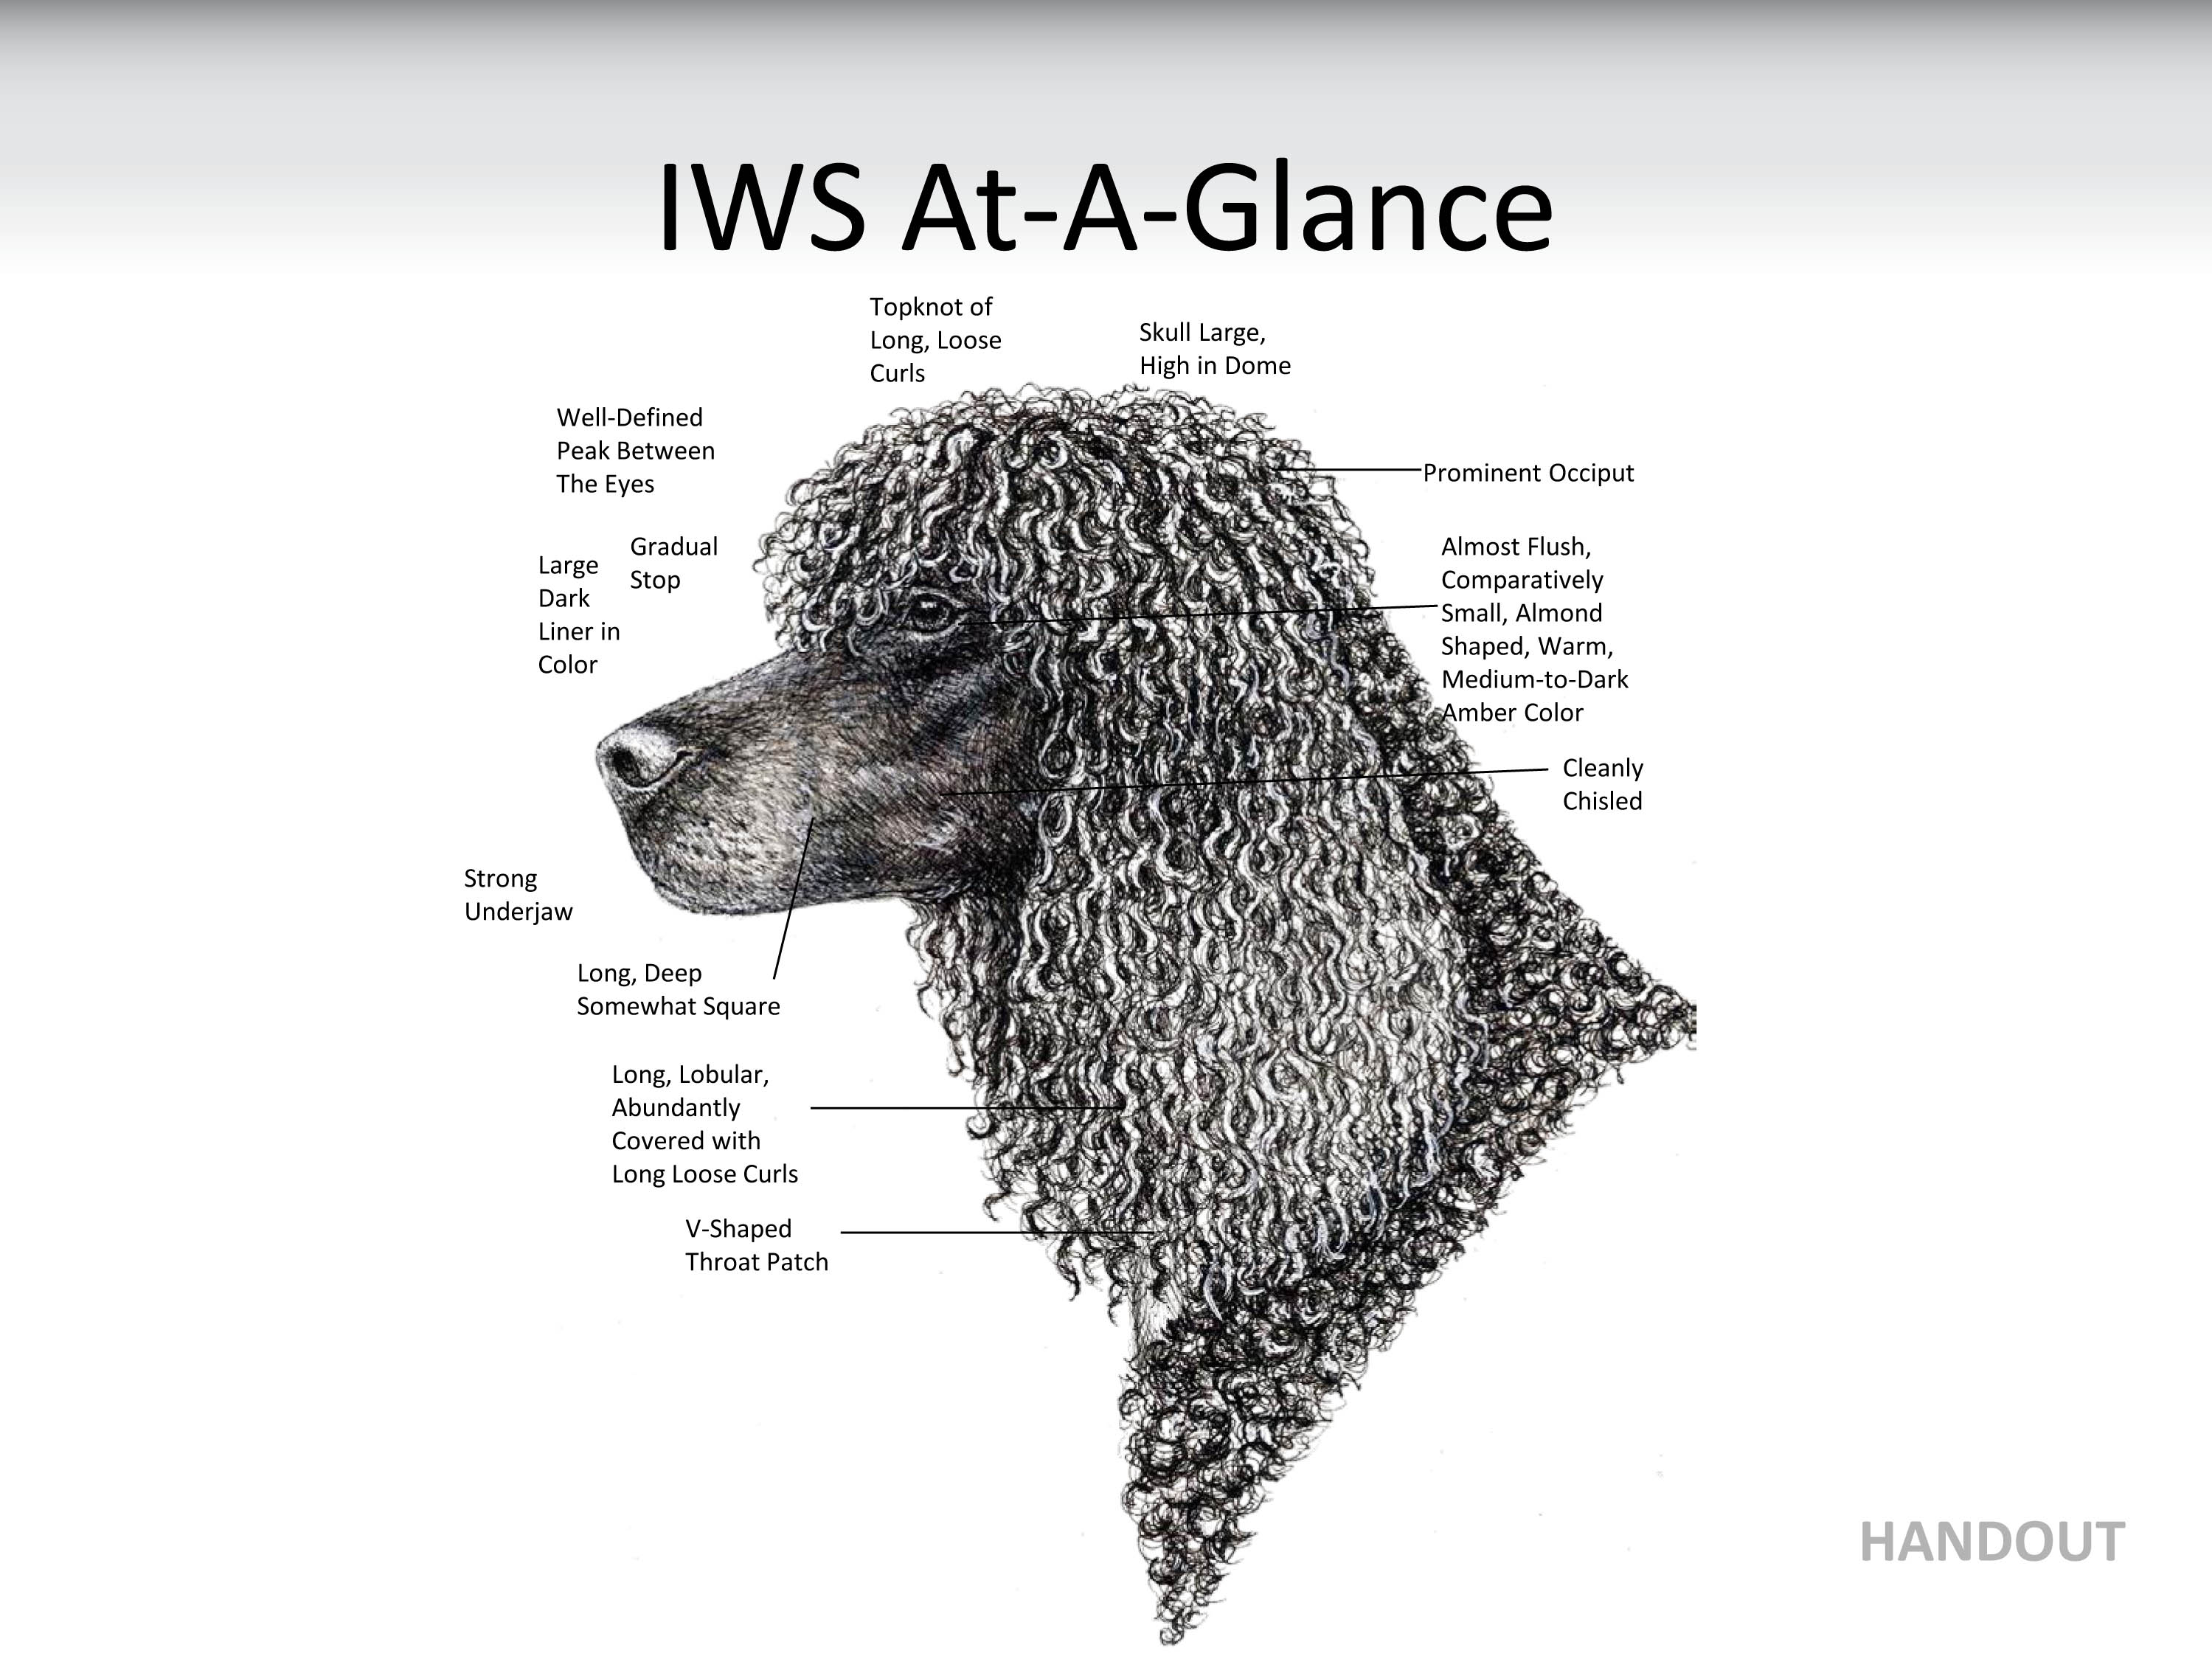 Irish Water Spaniel Club of America - IWS At-A-Glance